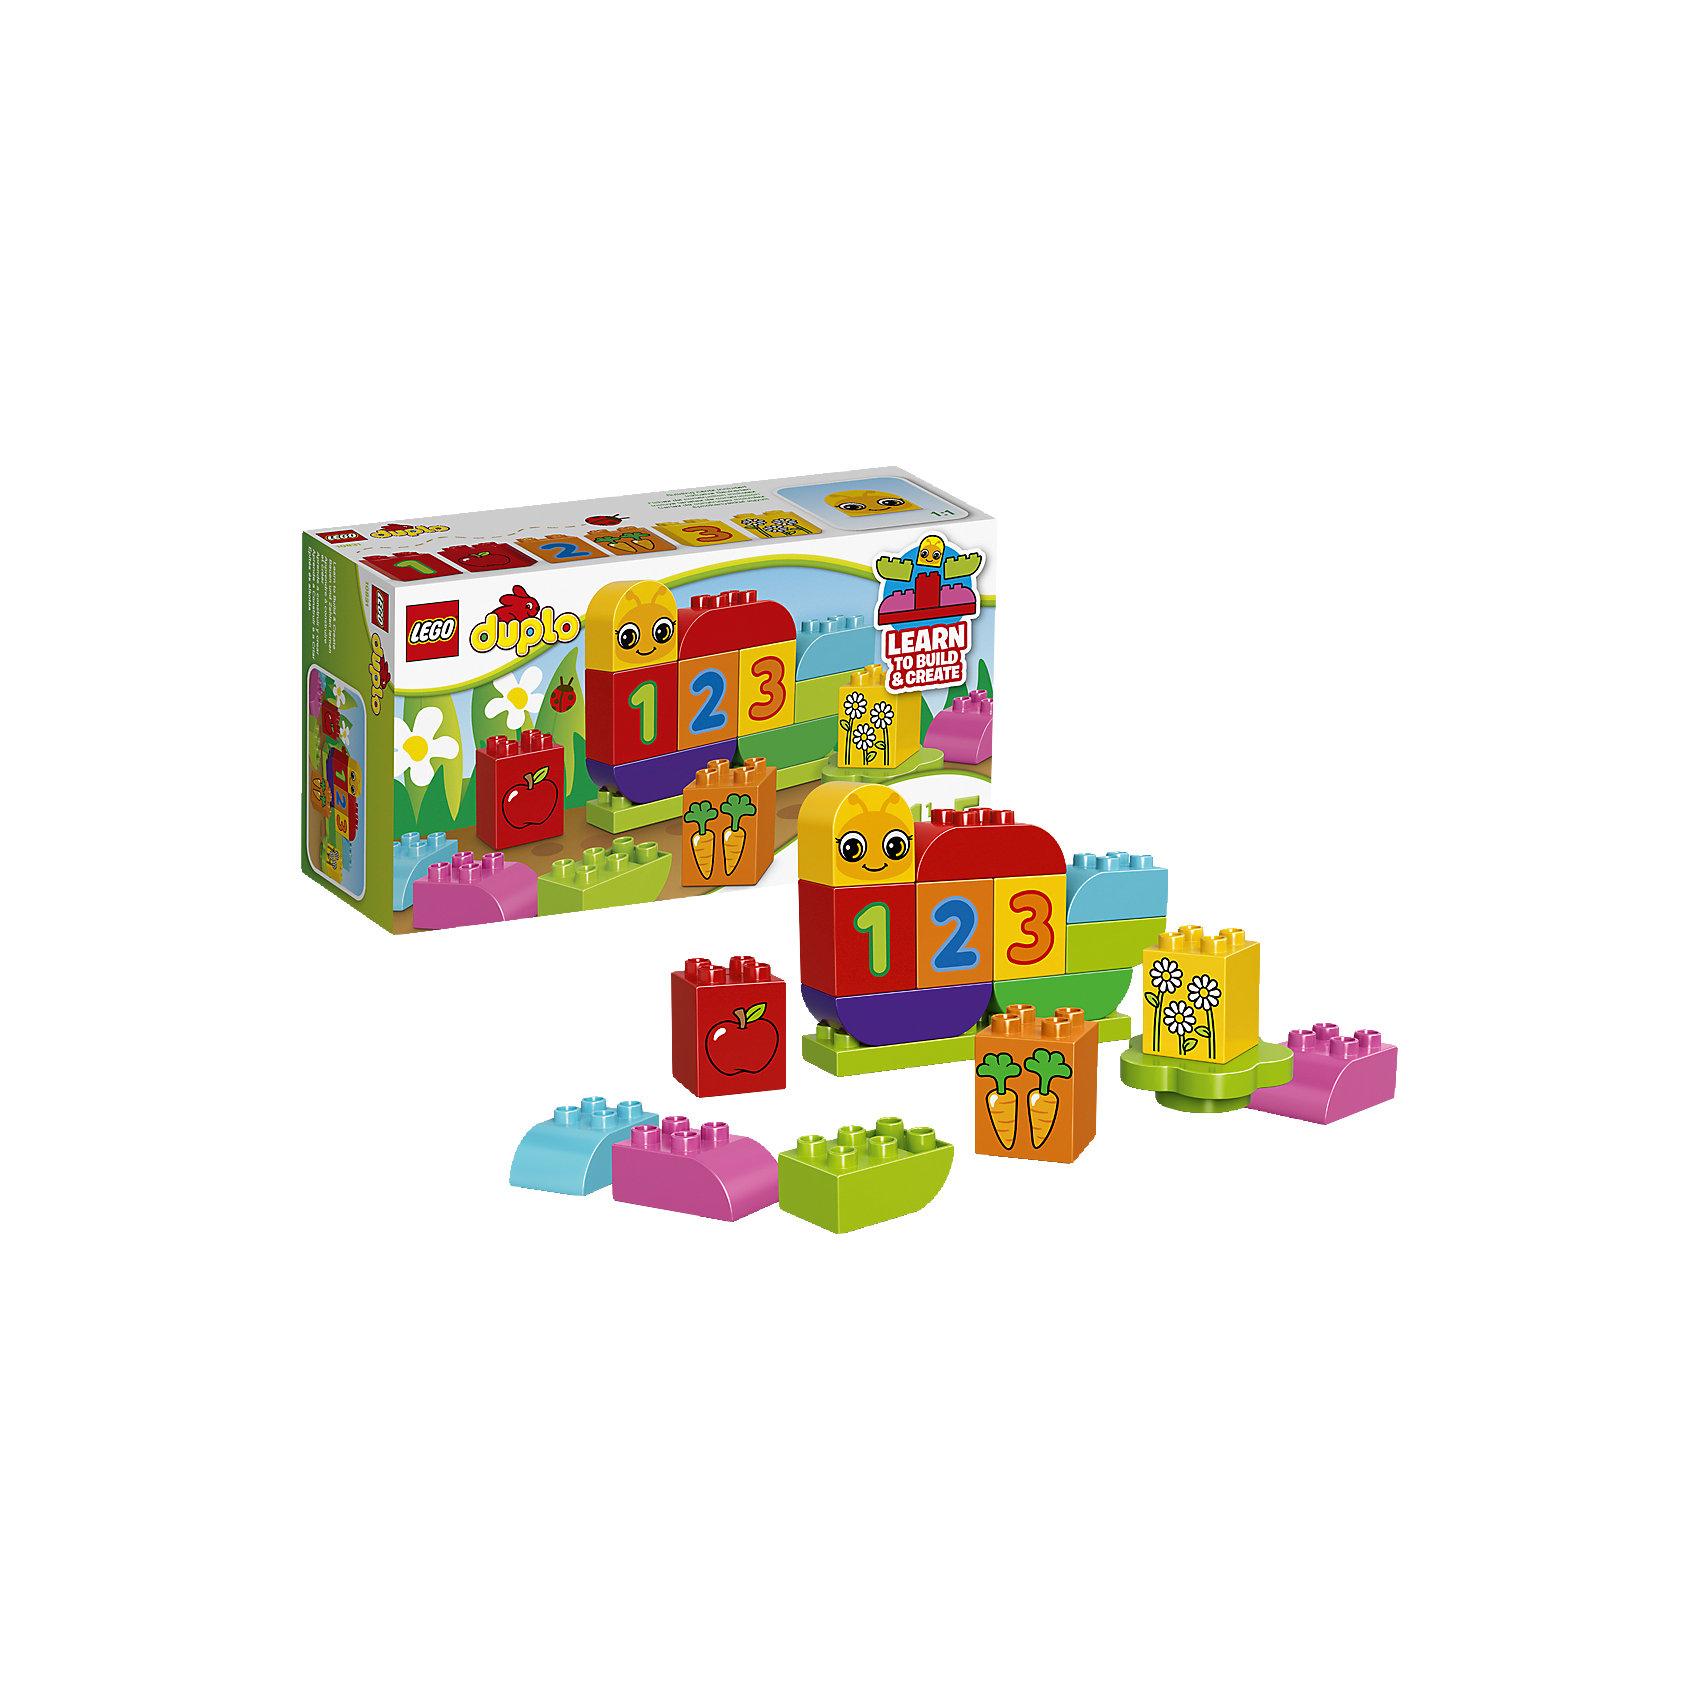 LEGO LEGO DUPLO 10831: Моя веселая гусеница lego lego duplo 10831 моя веселая гусеница